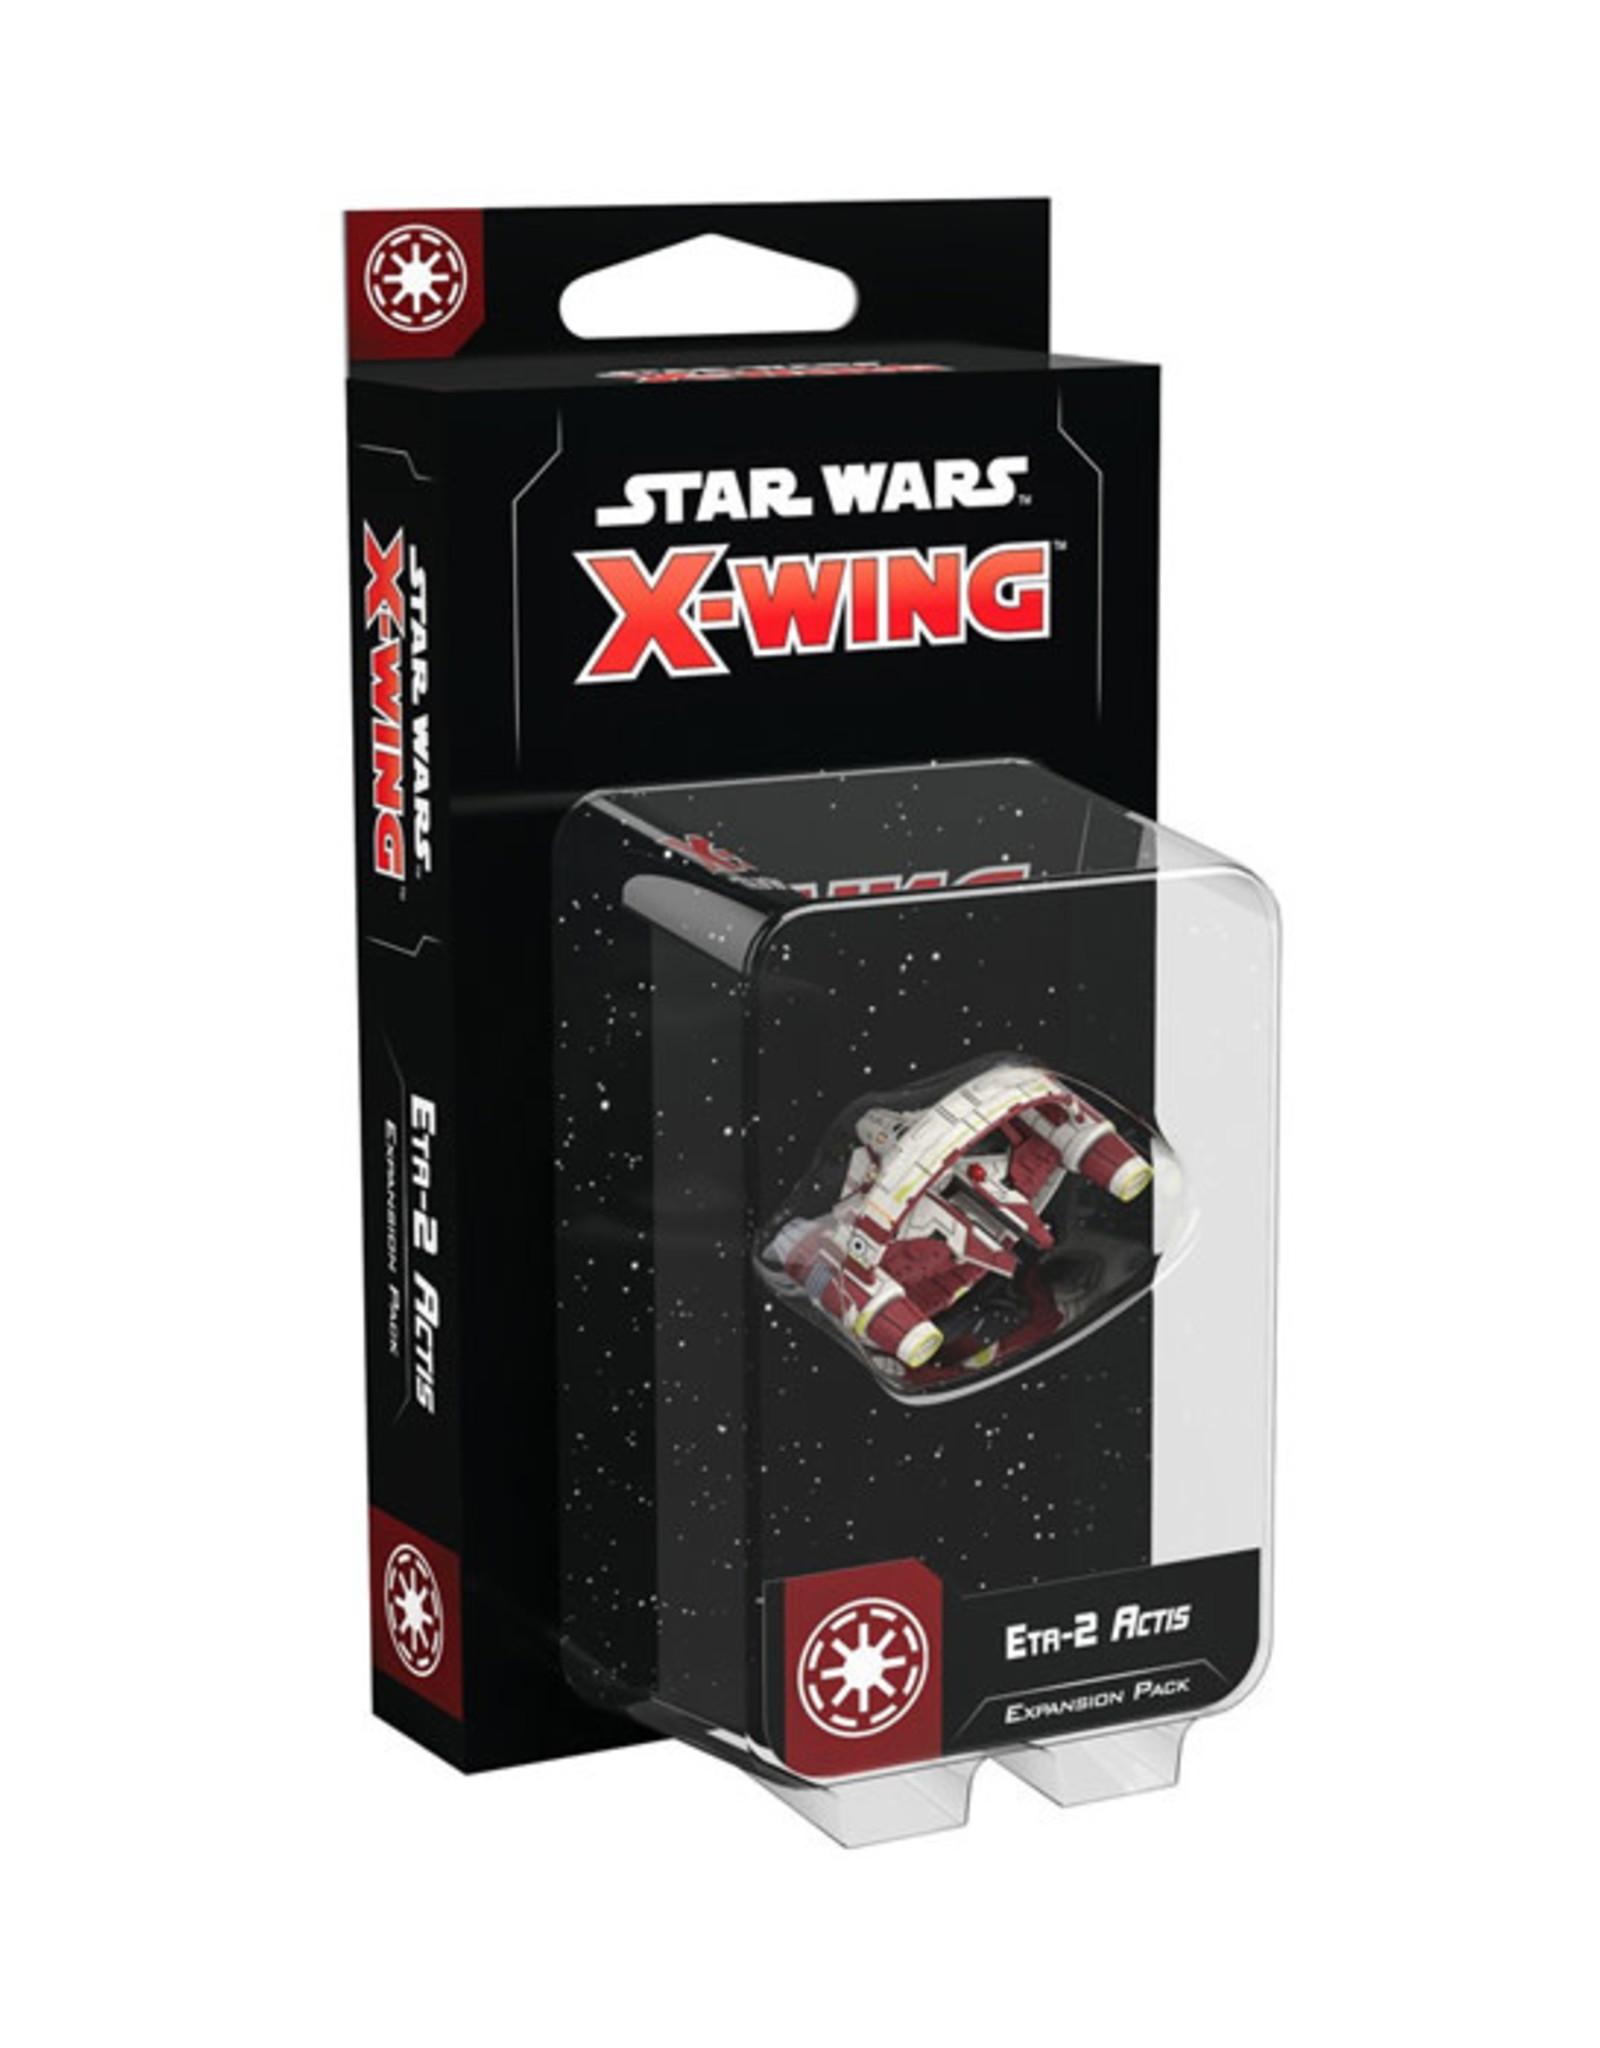 Fantasy Flight Games Star Wars: X-Wing - 2nd Edition - Eta-2 Actis